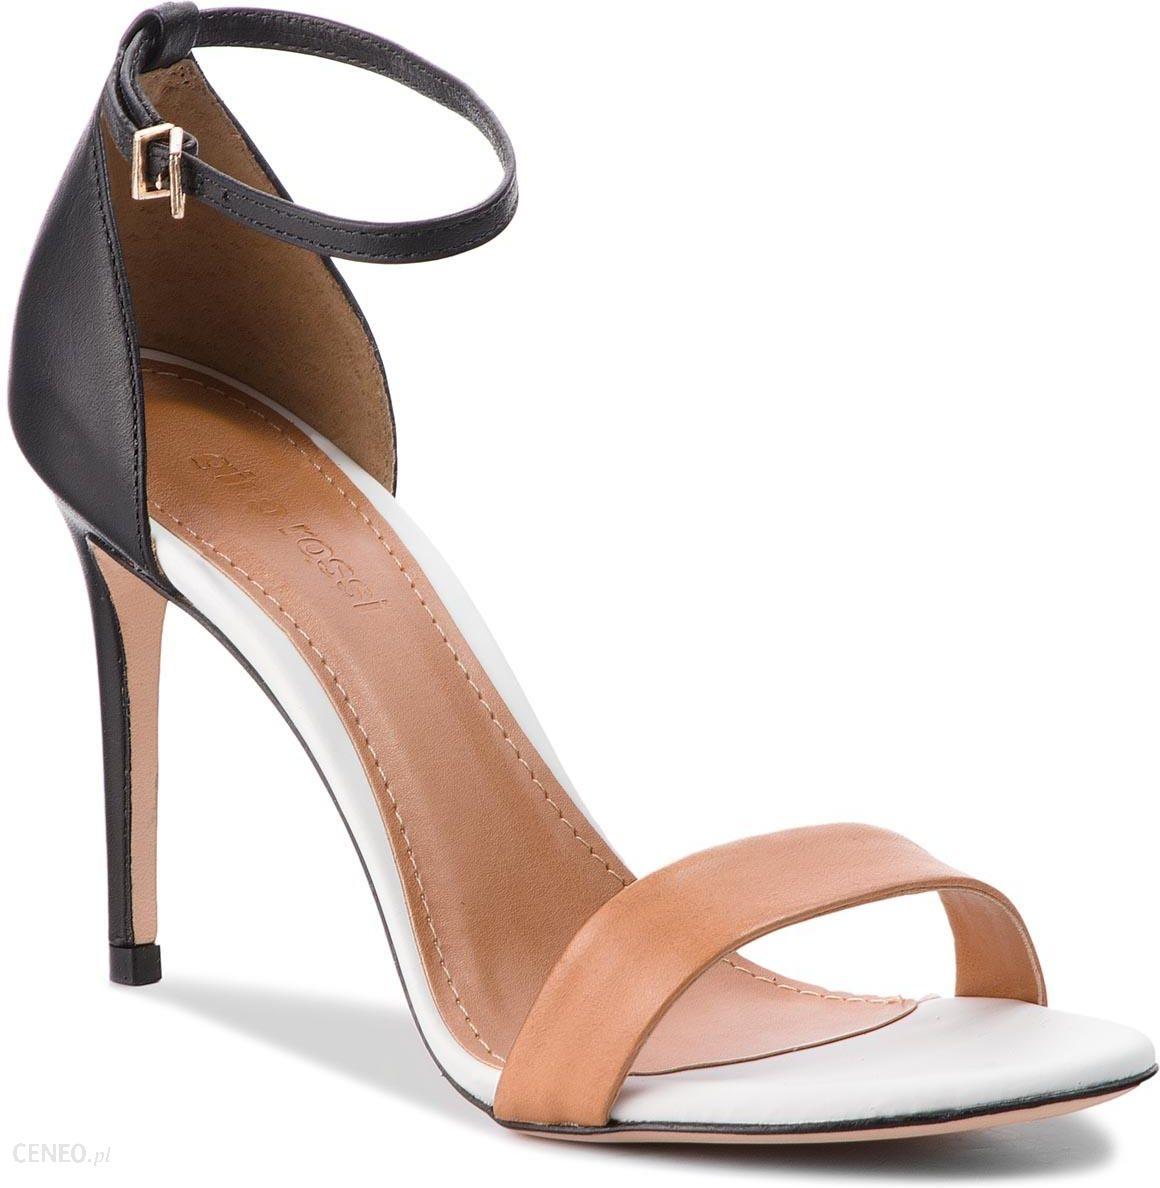 Sandały GINO ROSSI V222 115 1 Black